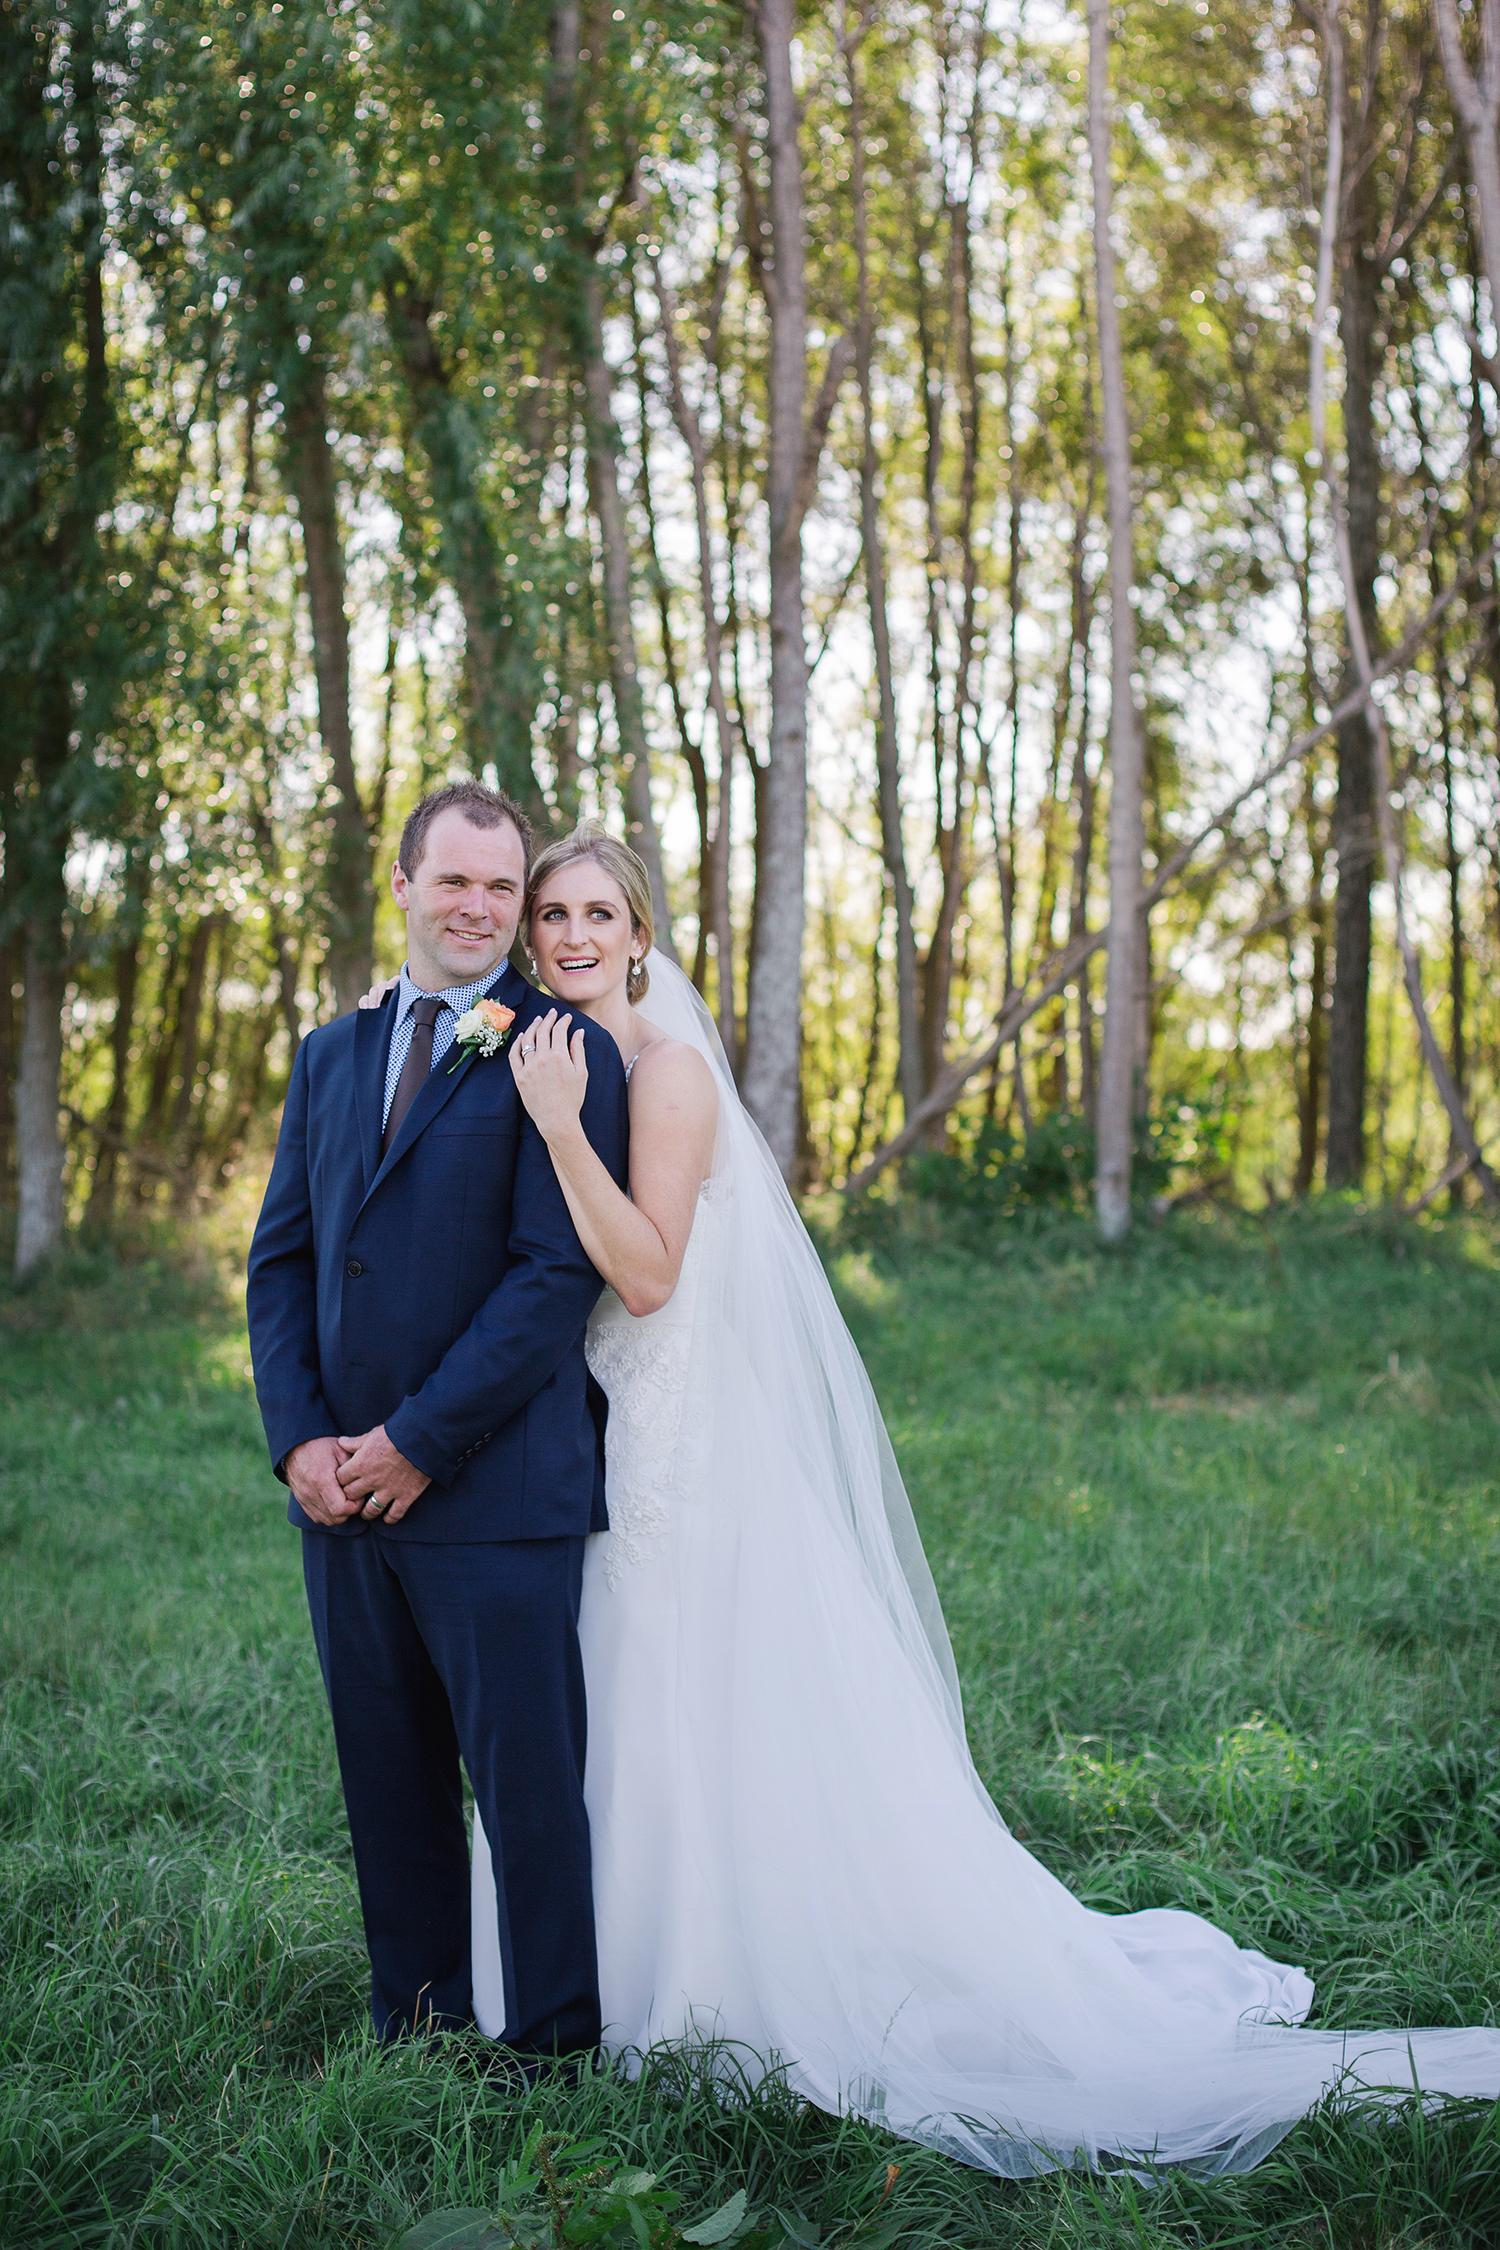 Toni-Larsen-Katie+Willy-Wedding-24.jpg